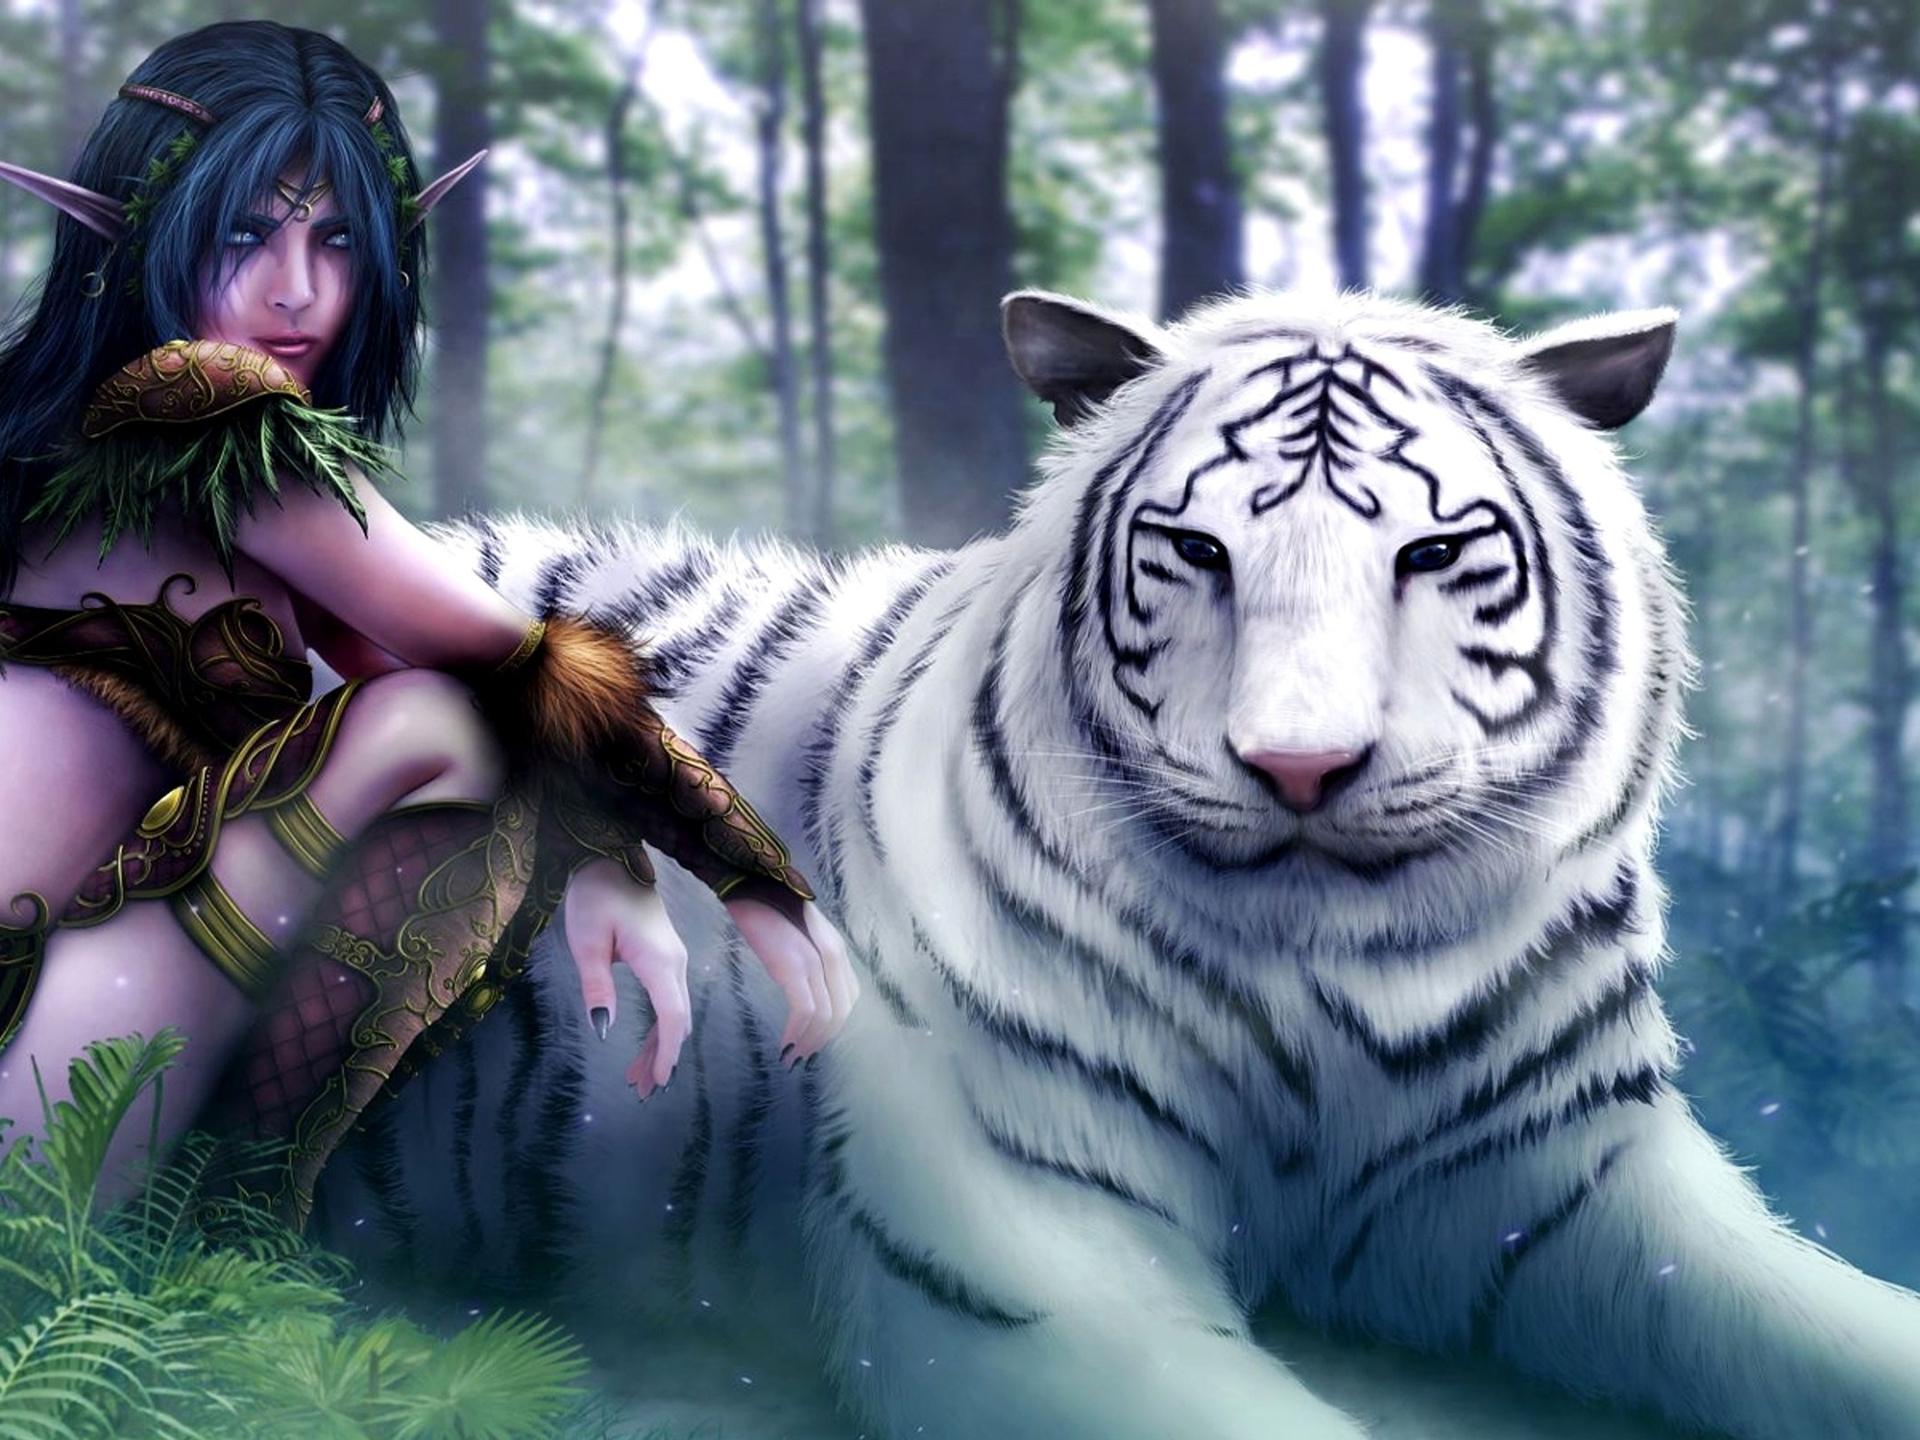 World of warcraft white tiger fantasy art elves artwork drawings (1920x1440)